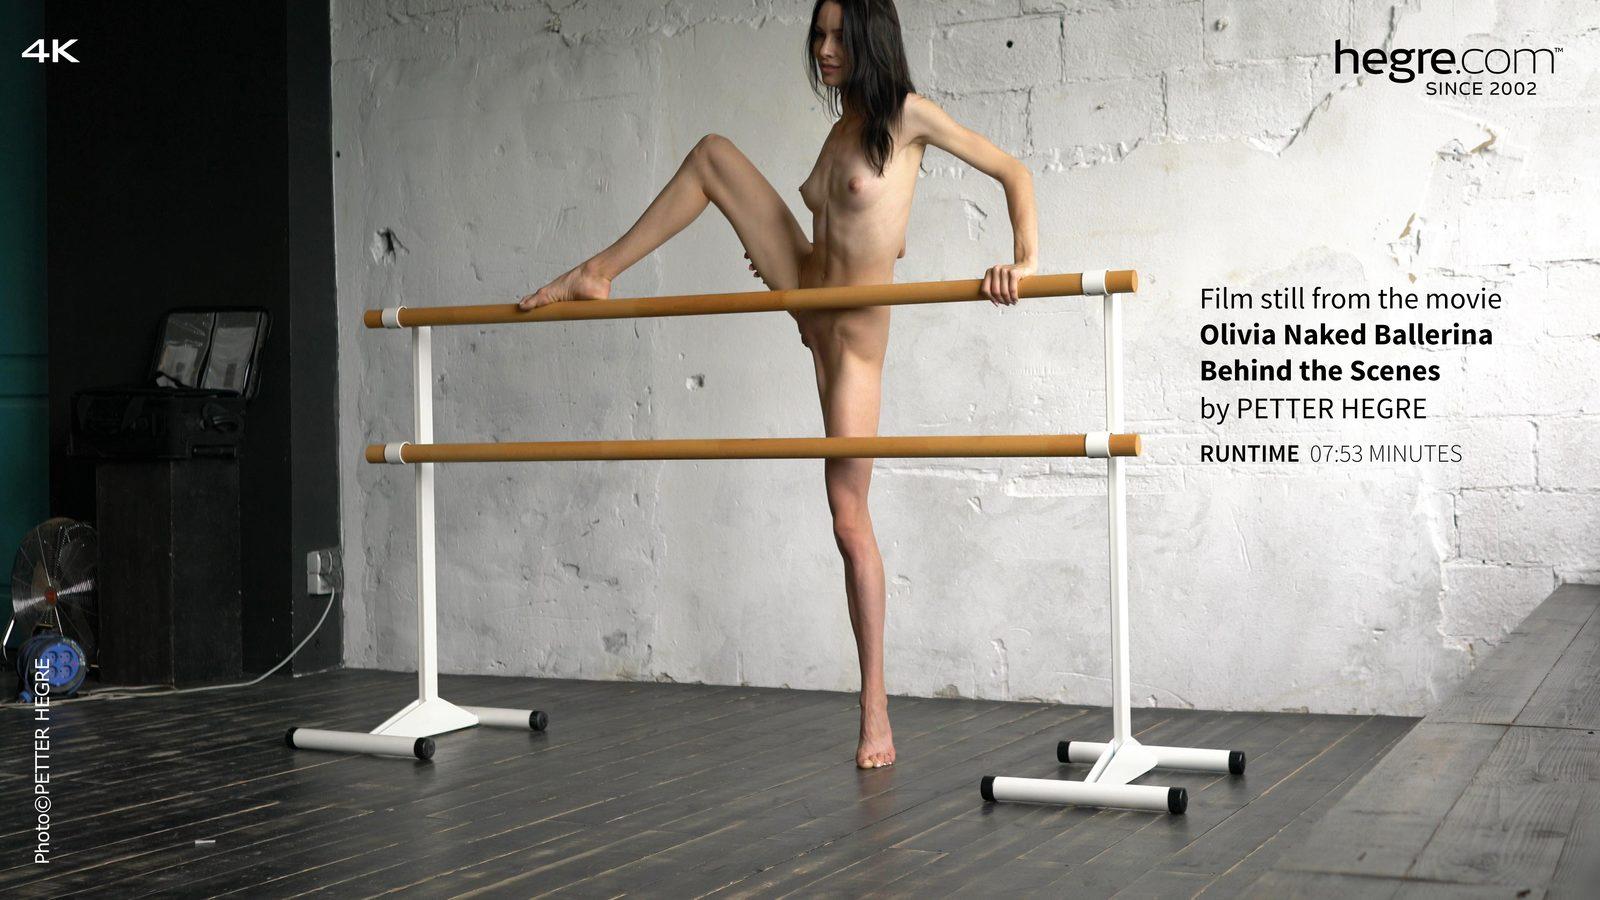 UNCENSORED [hegre-art]2017-08-08 Olivia Naked Ballerina Behind The Scenes, AV uncensored